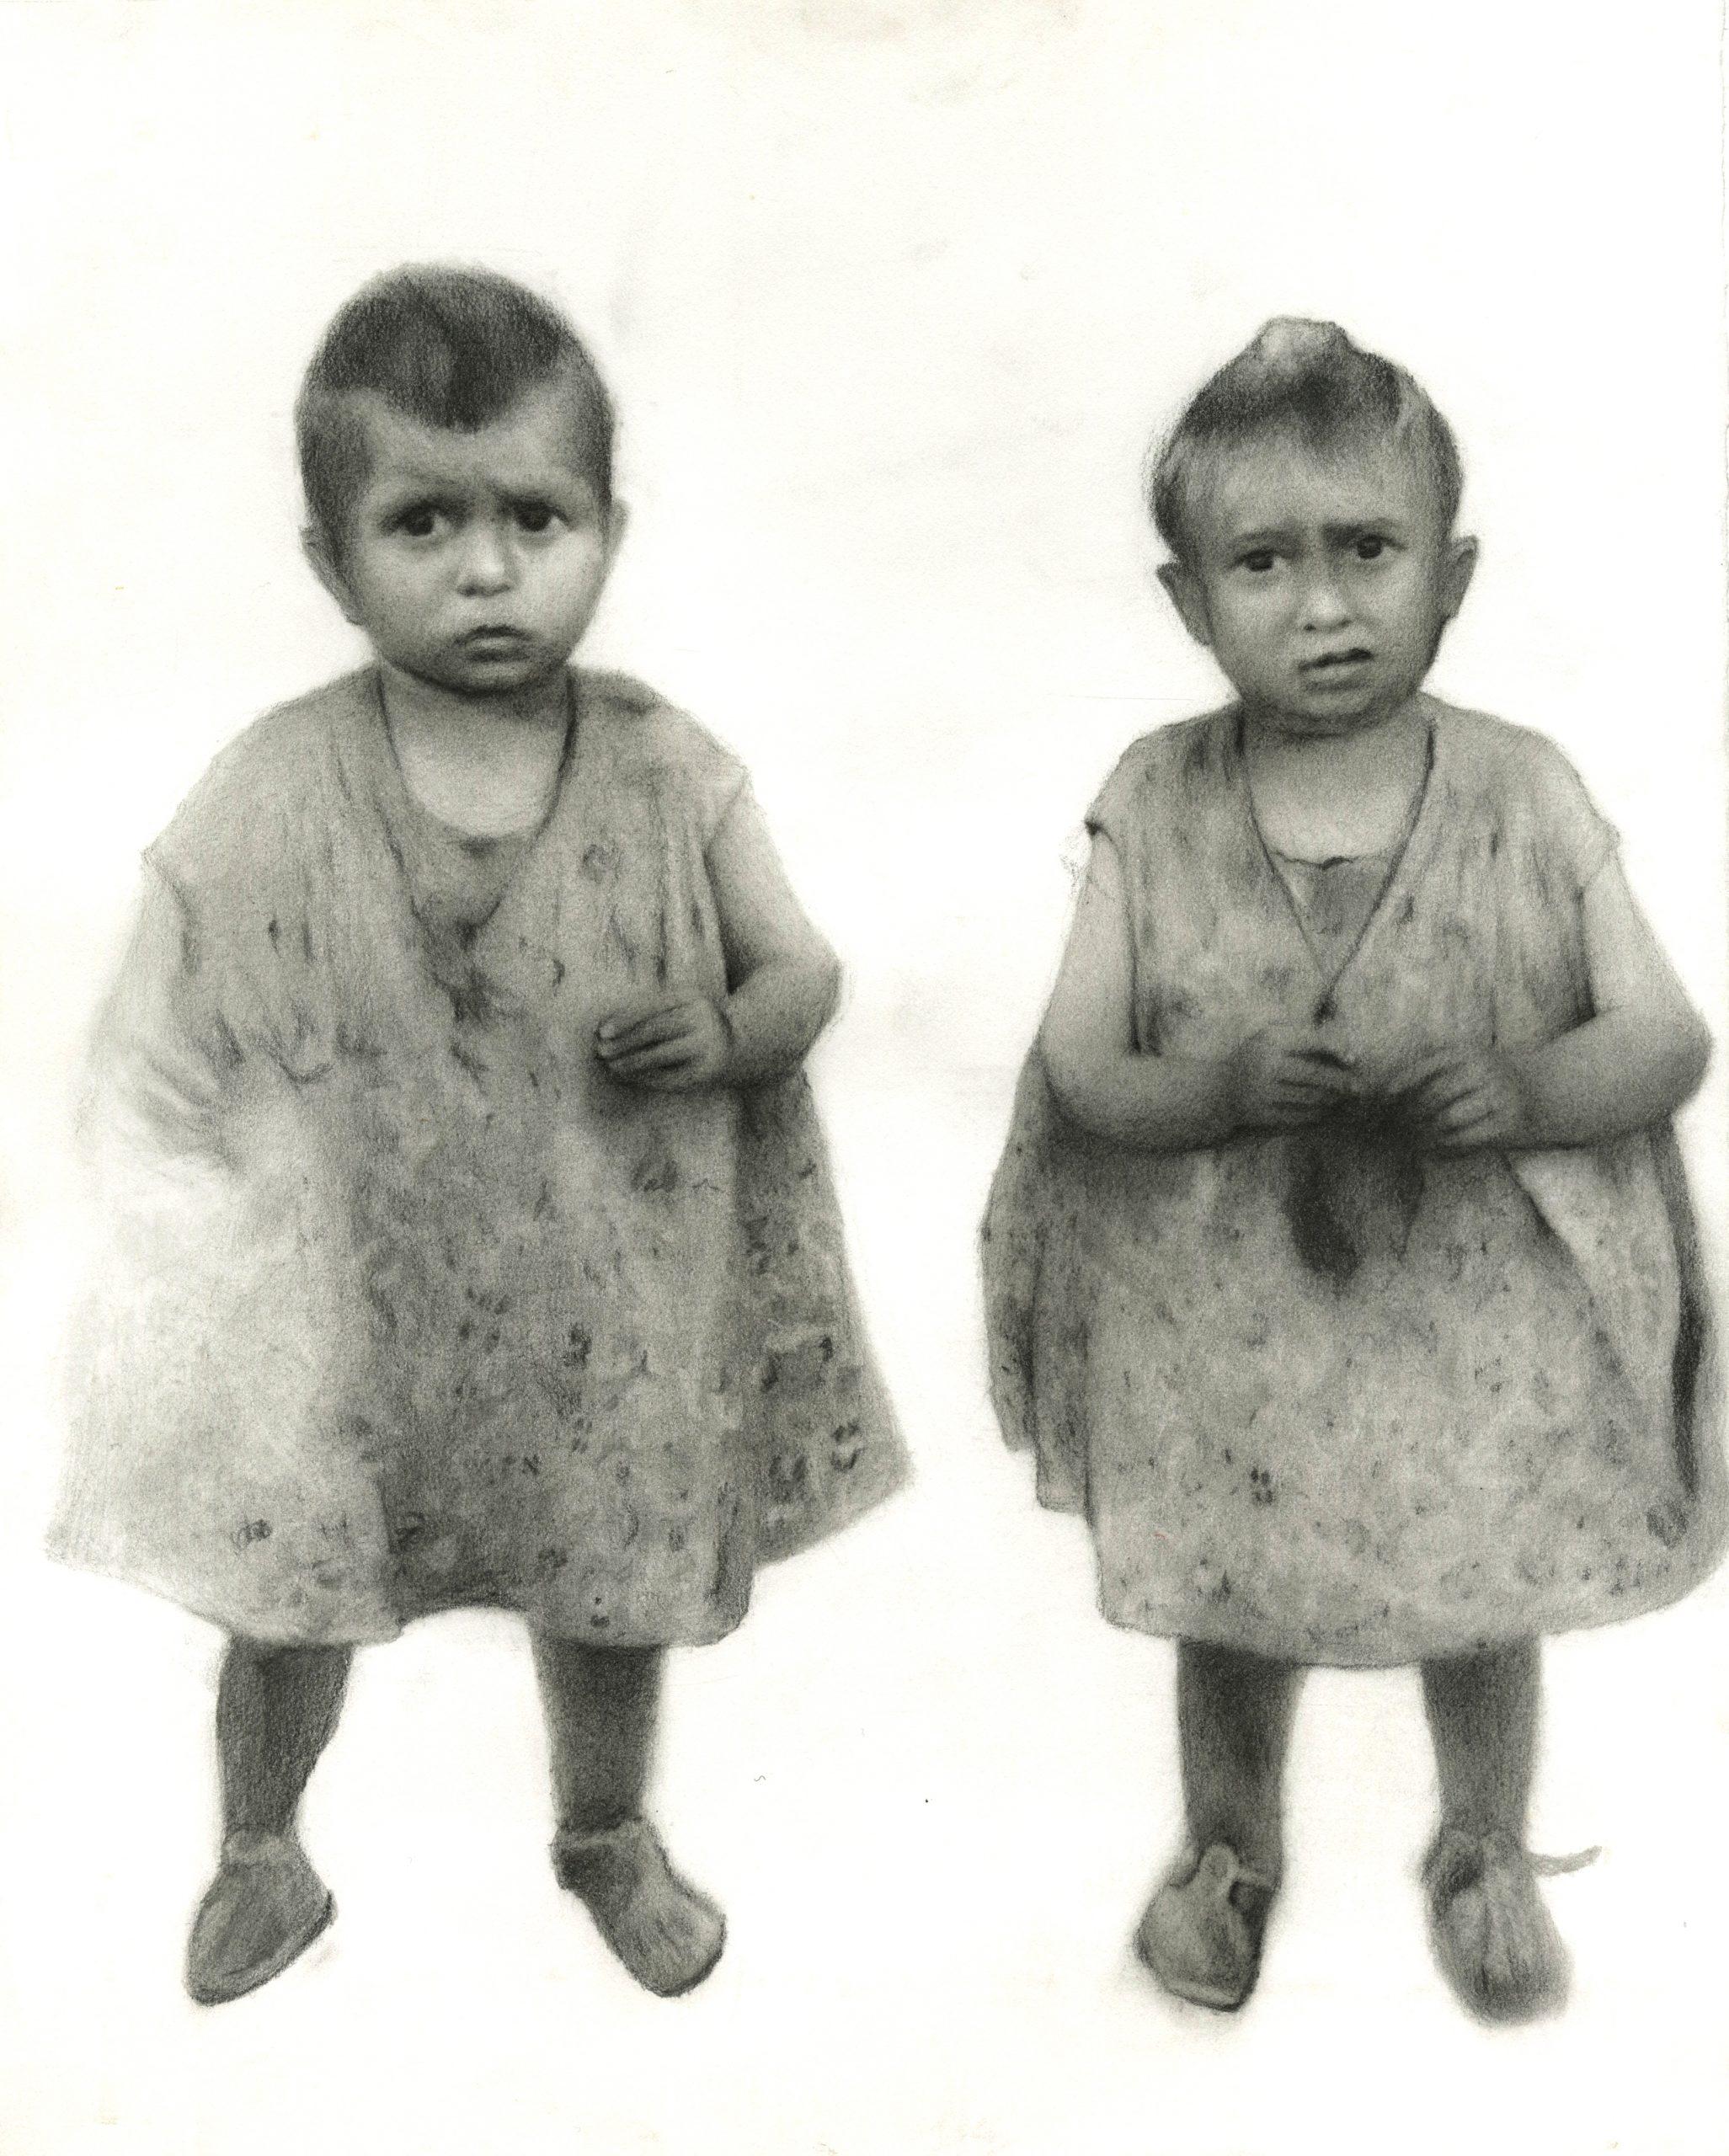 Twins 2019, pencil on paper, 35 x 28.5 cm